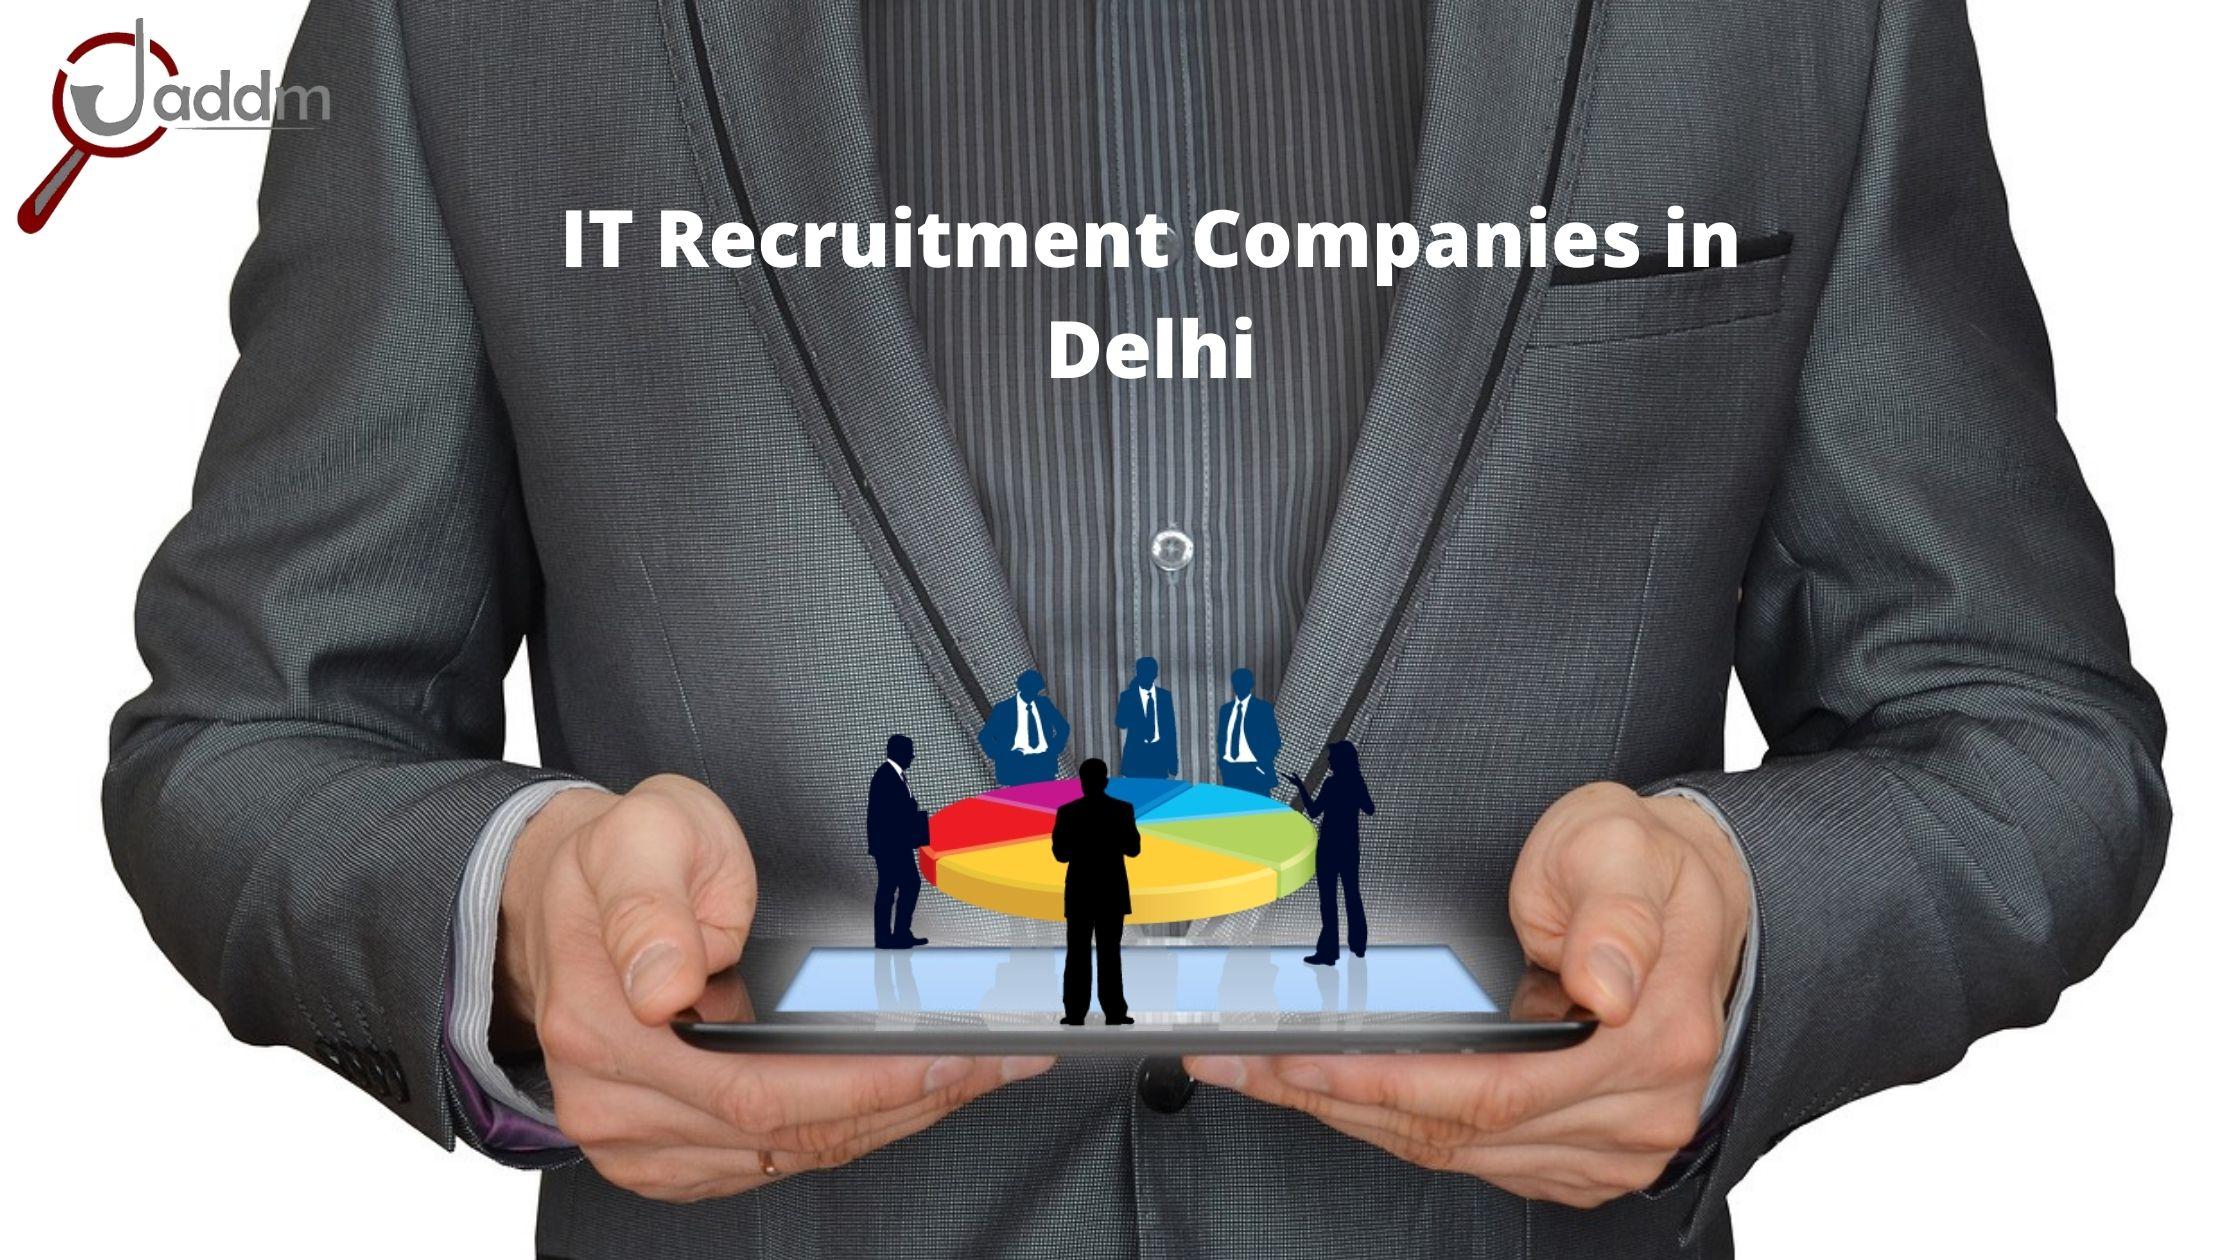 IT Recruitment Companies in Delhi | Recruitment and staffing companies